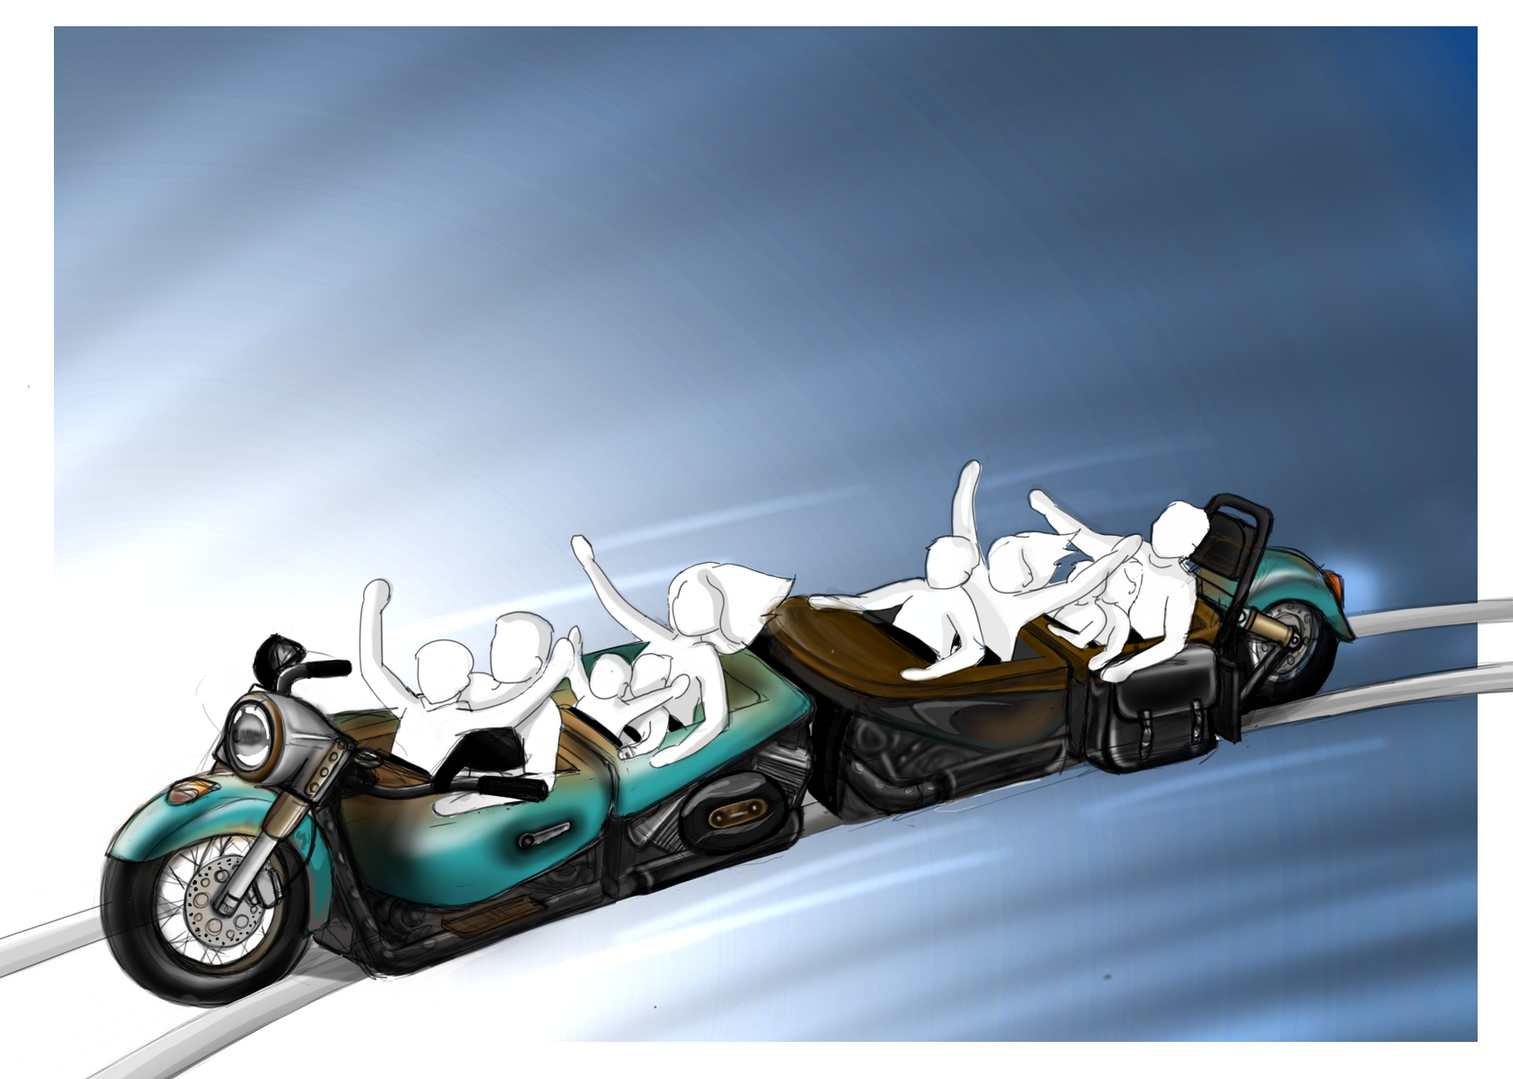 191217 giulia iron motorcycle 02 color (